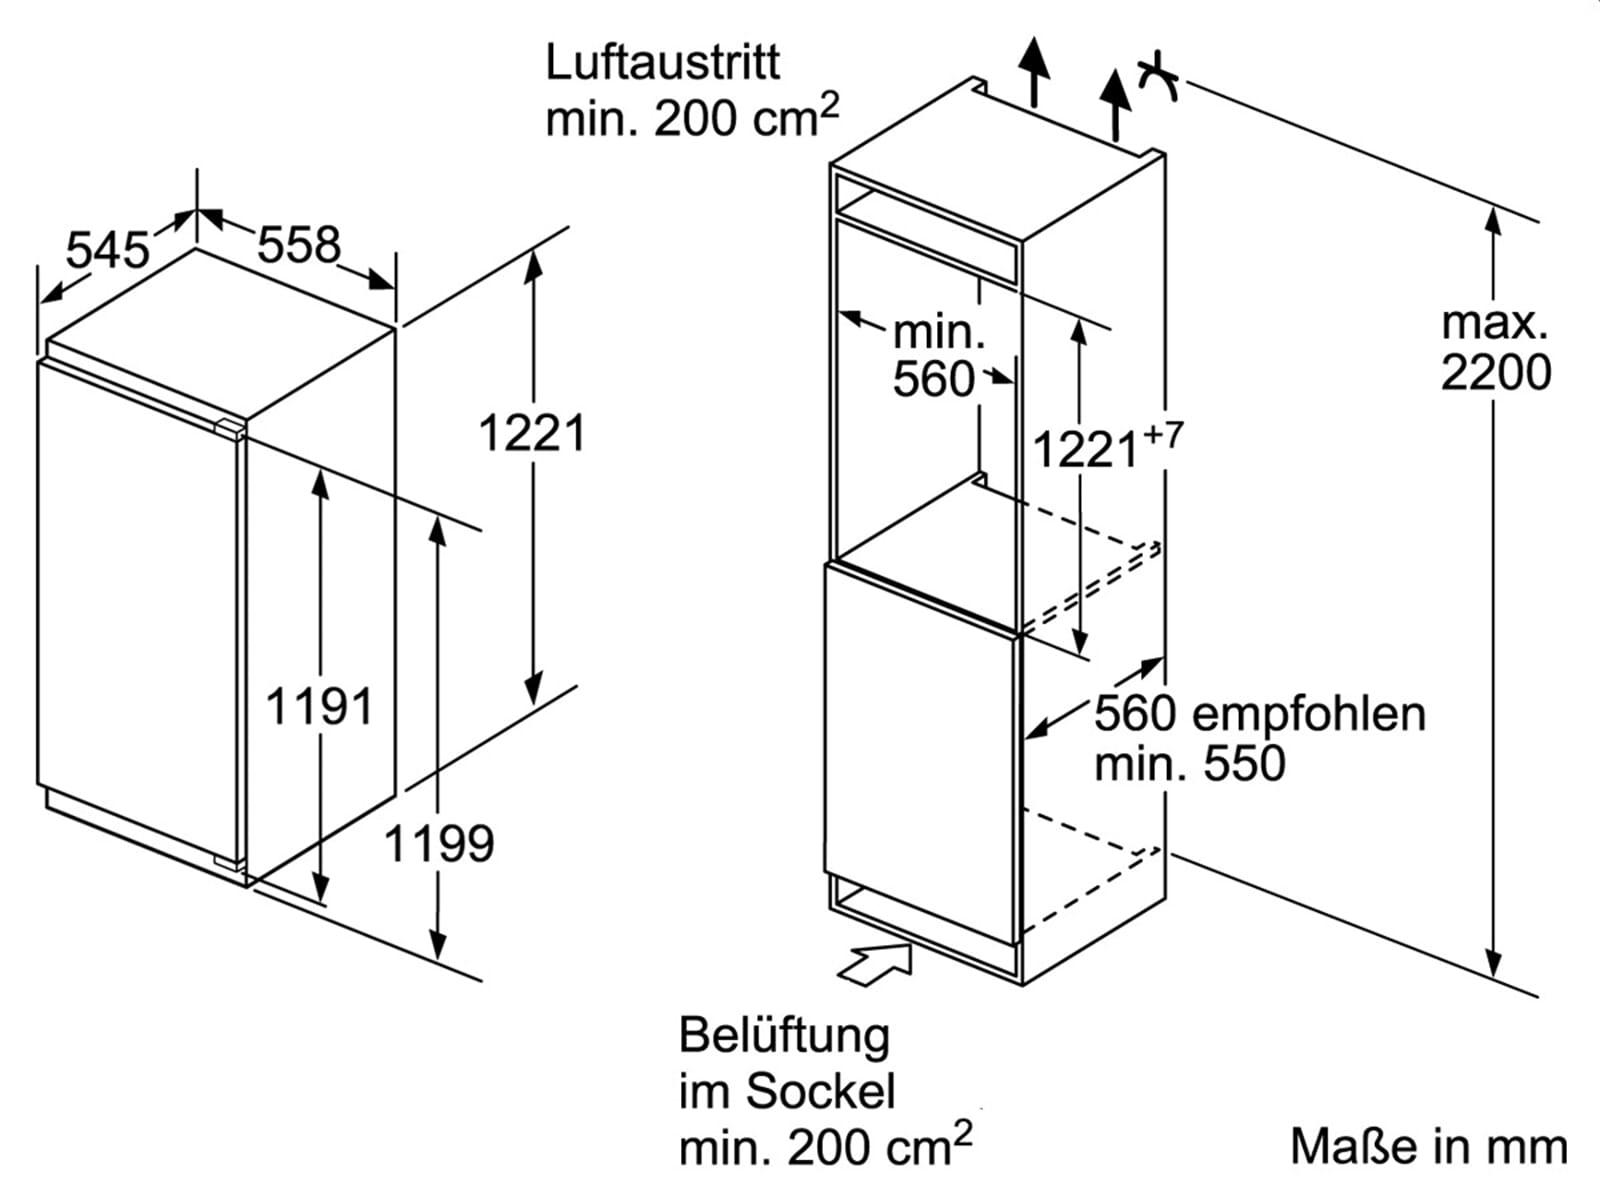 bosch kif41af30 einbauk hlschrank 122 5 cm k hlschrank flachscharnier ebay. Black Bedroom Furniture Sets. Home Design Ideas